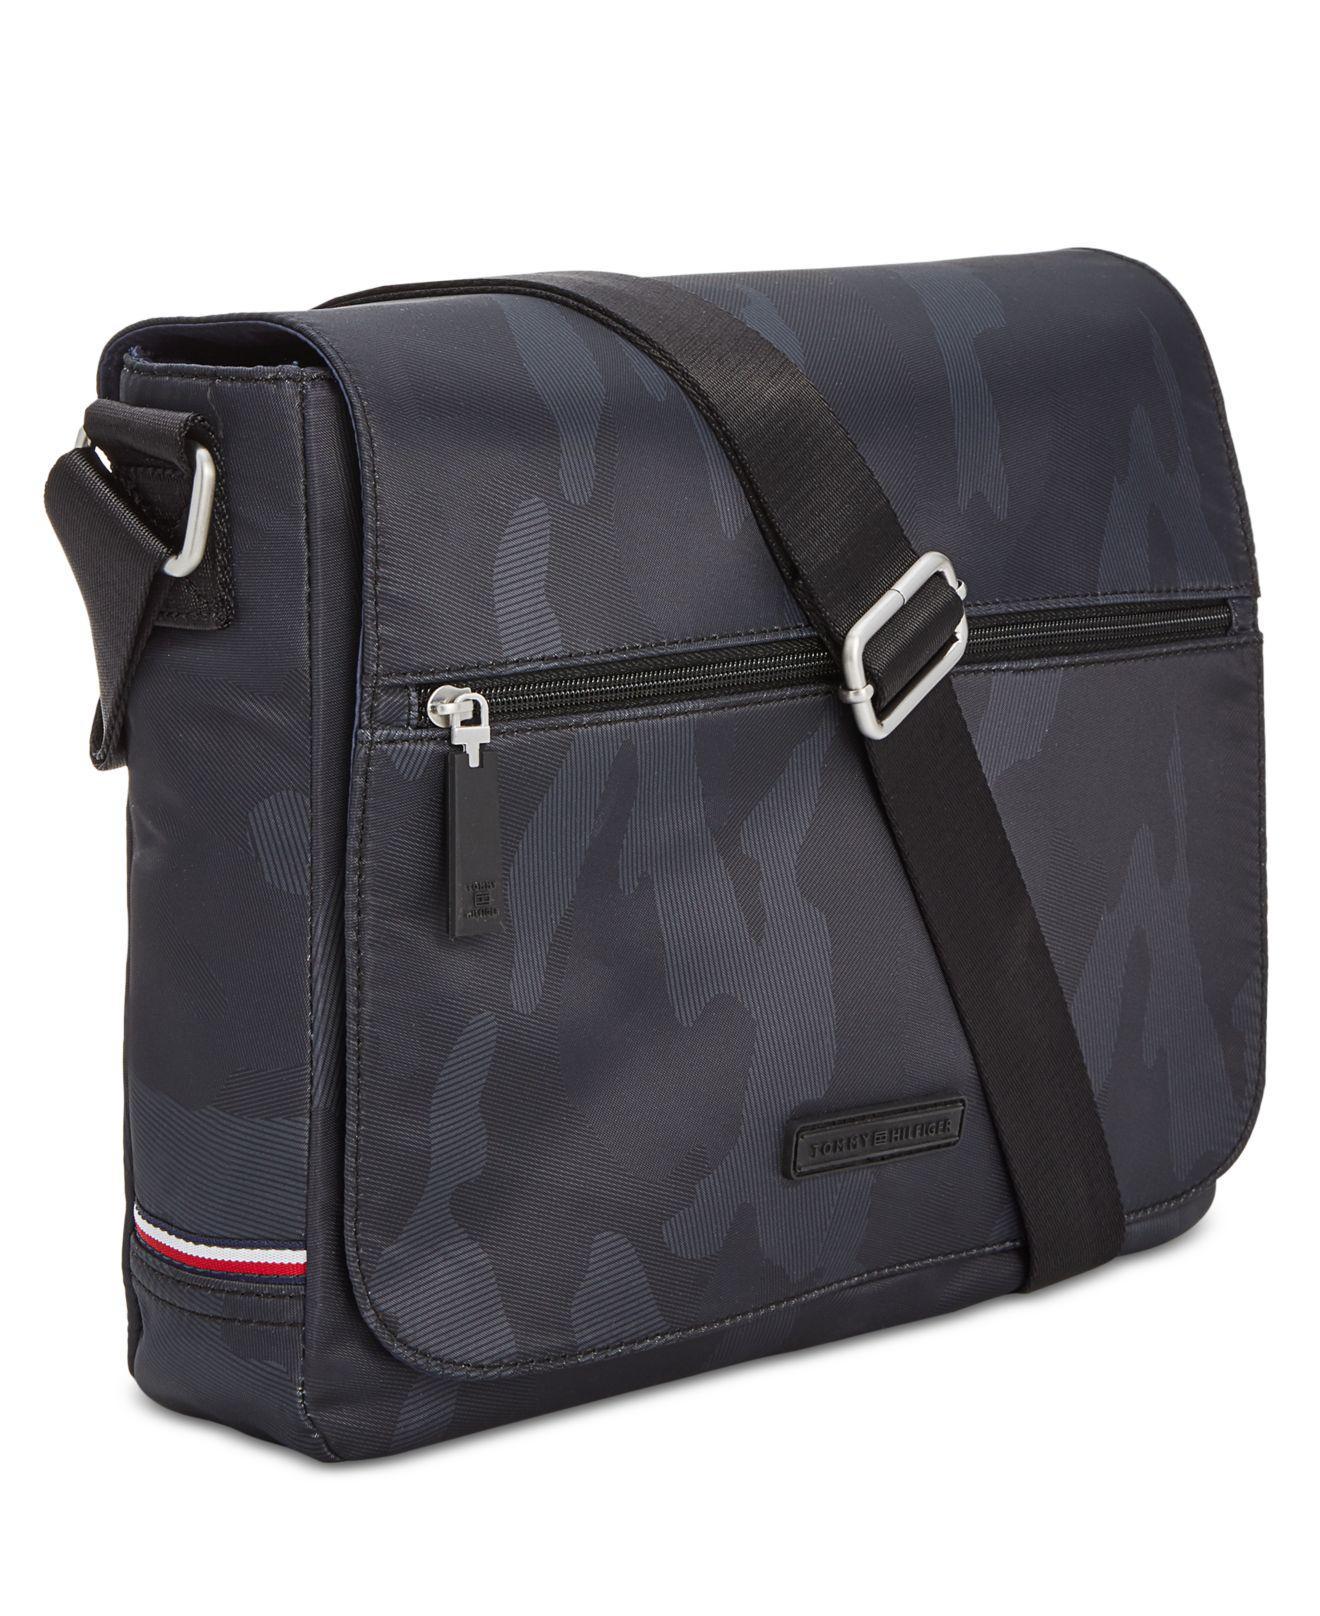 a5e75ea08eb2 Lyst - Tommy Hilfiger Camo Messenger Bag in Black for Men